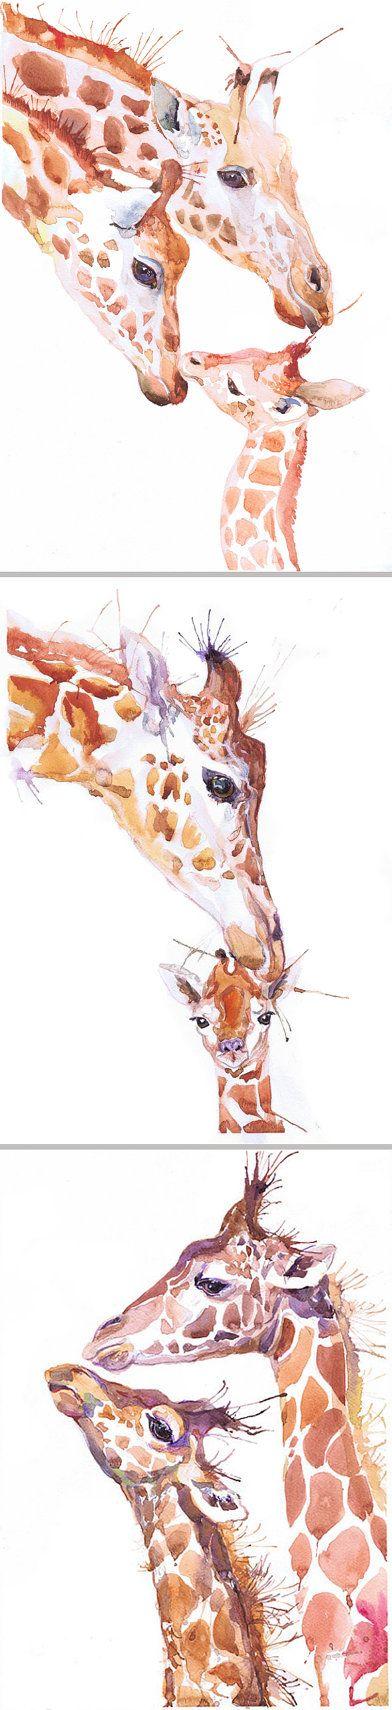 Giraffe art print animal art painting watercolor by ValrArt